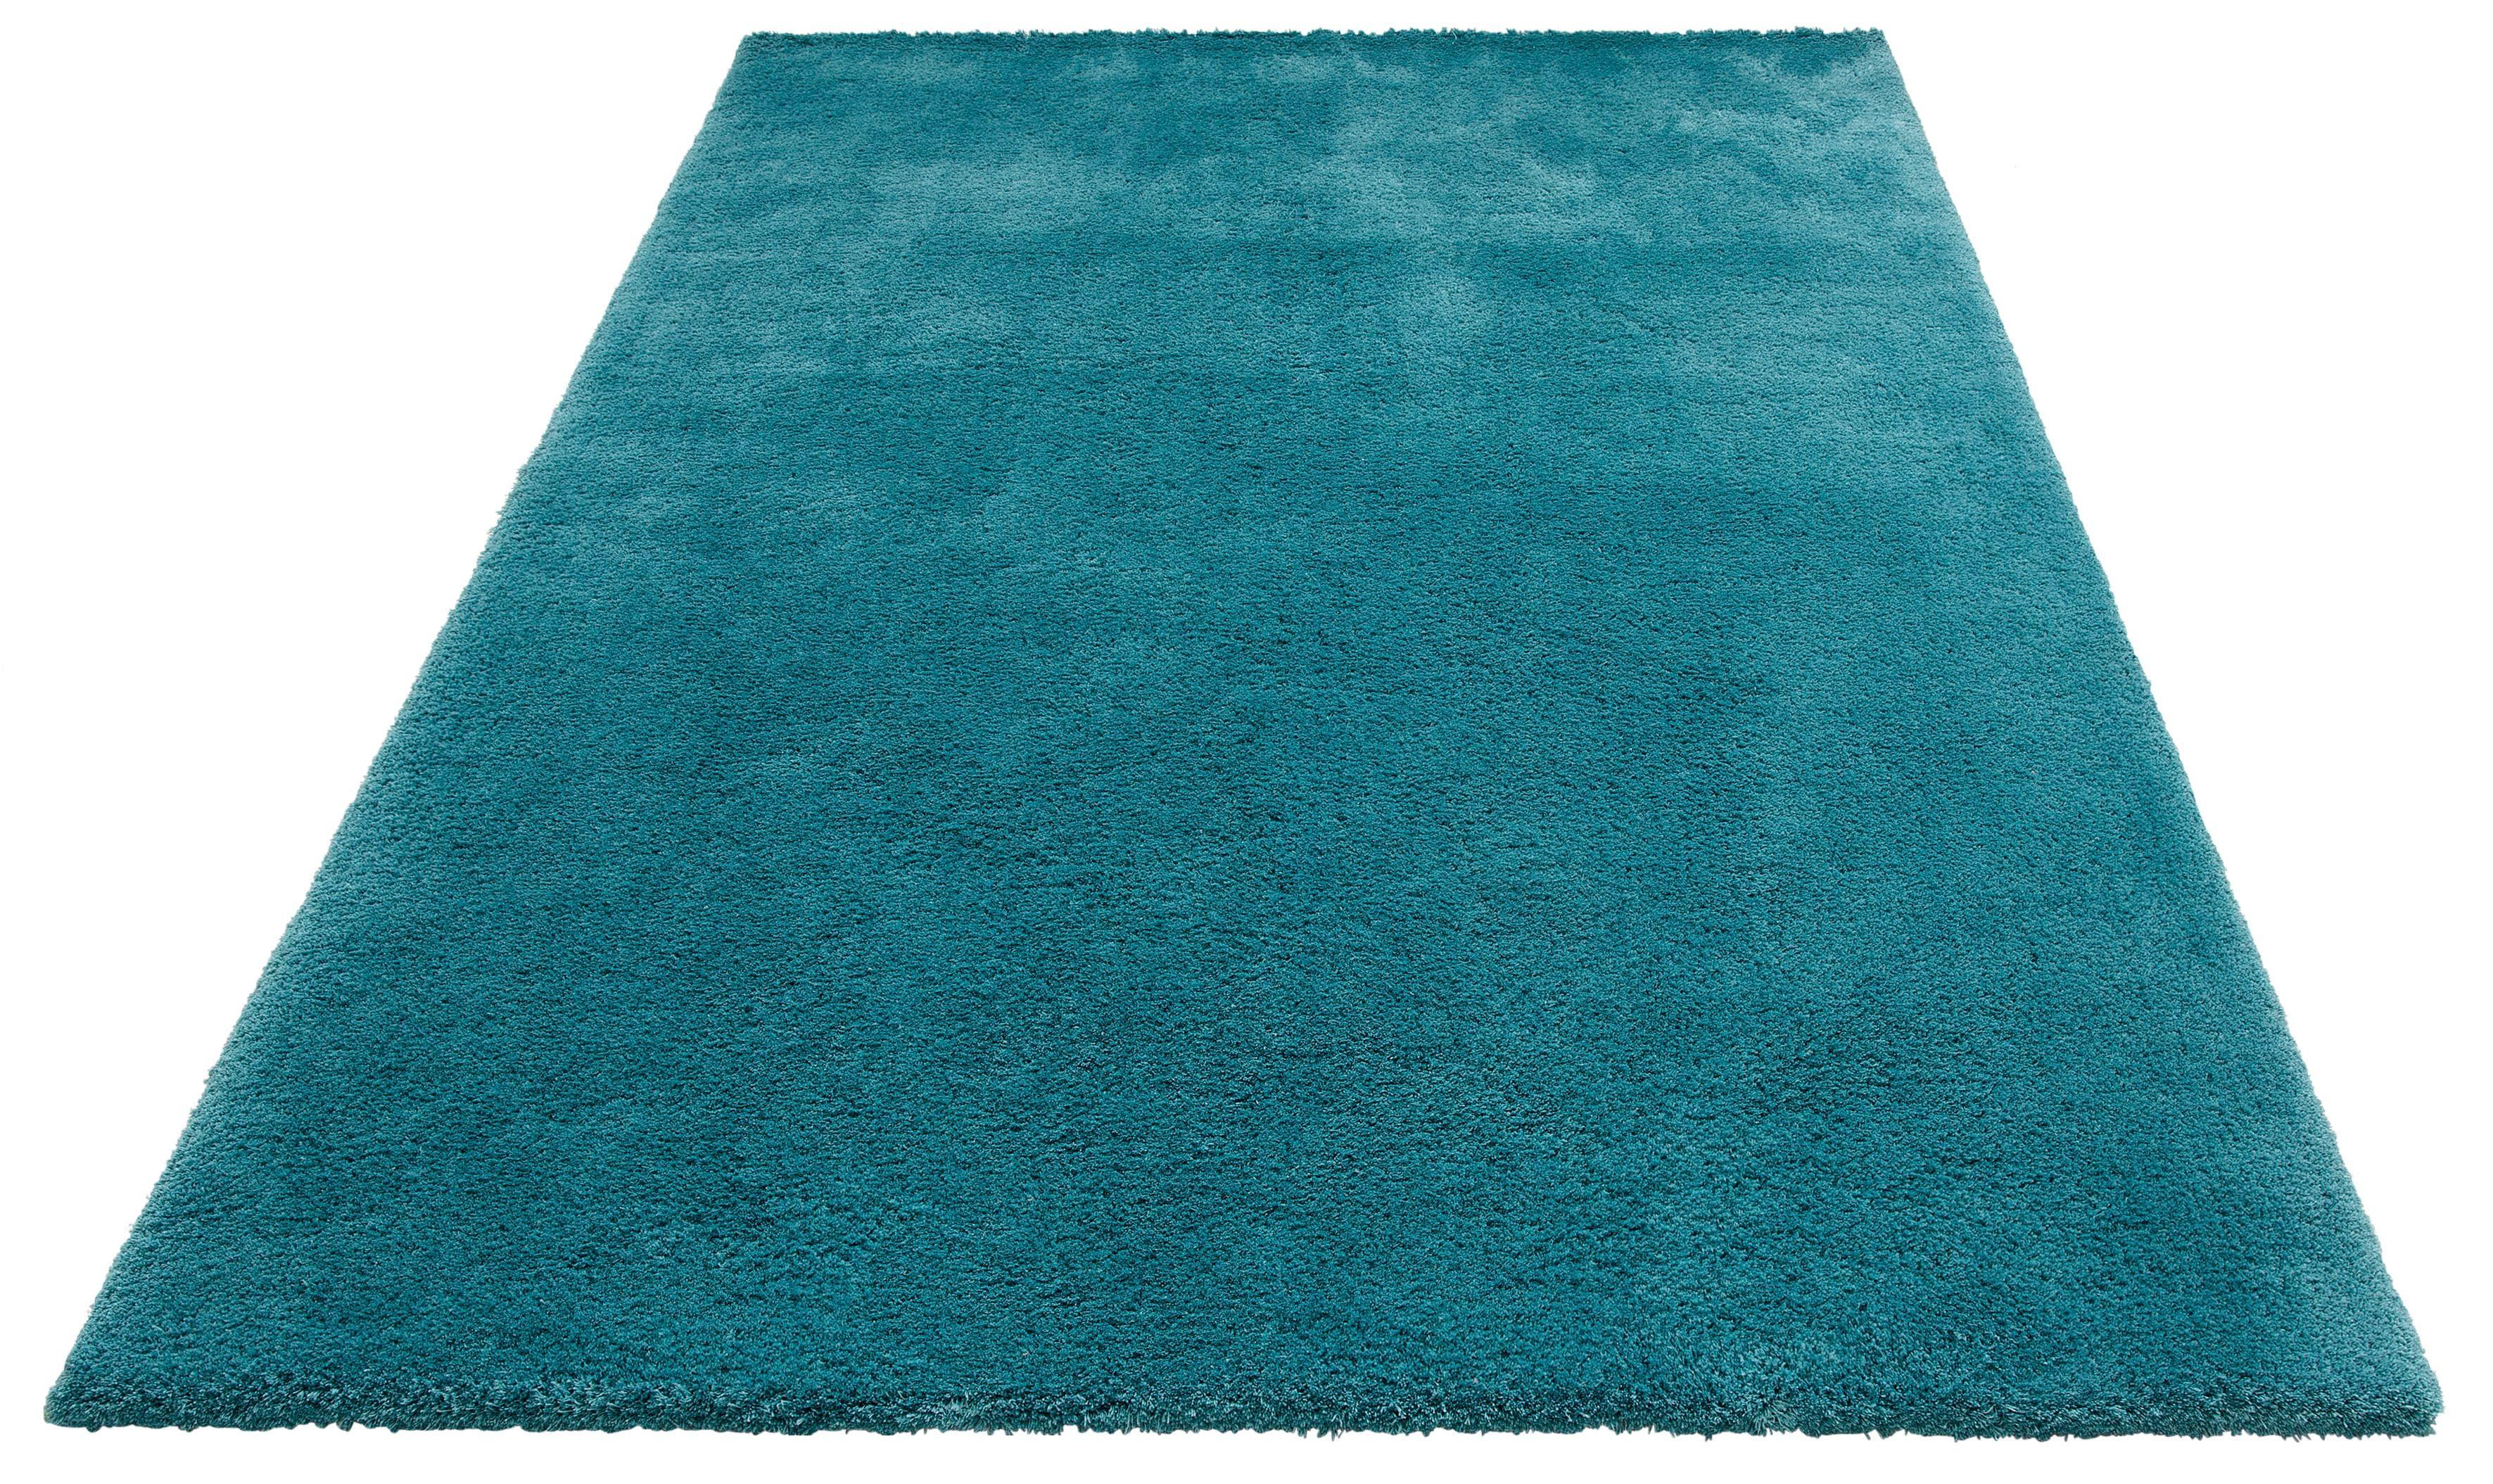 Hochflor-Teppich Magong my home rechteckig Höhe 25 mm handgetuftet